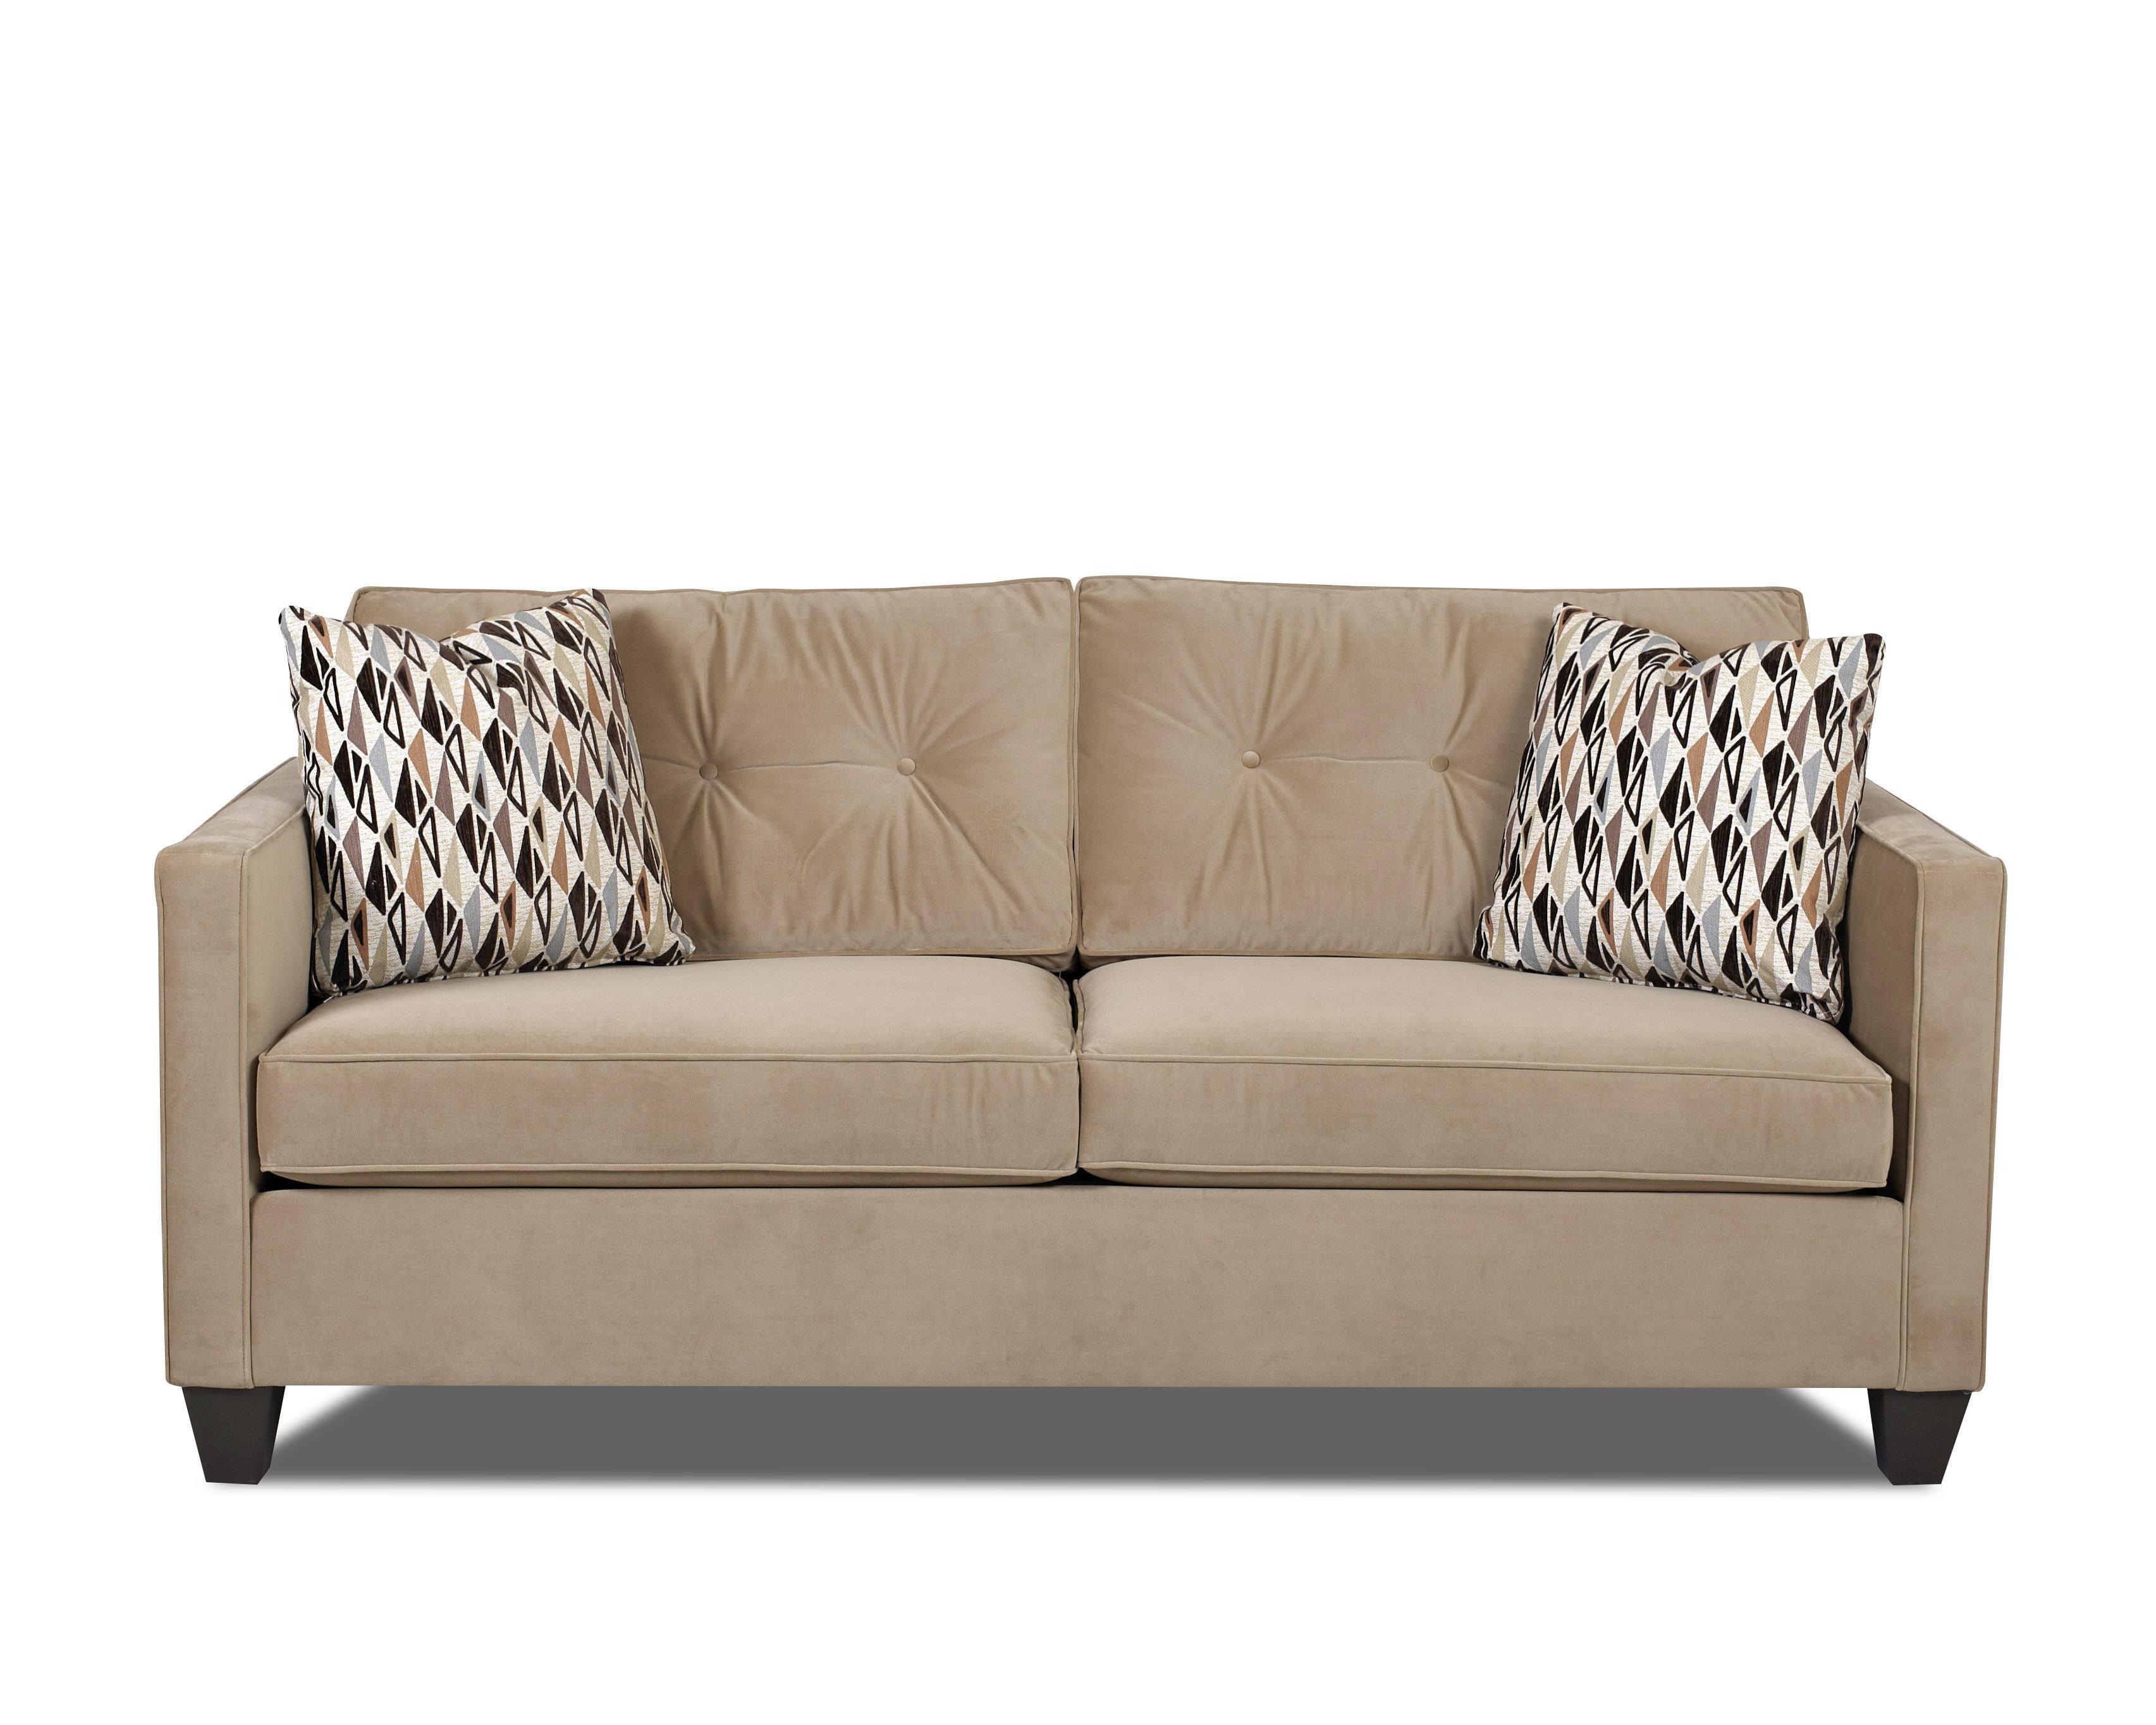 Superieur Klaussner Furniture Monroe Sofa | Wayfair